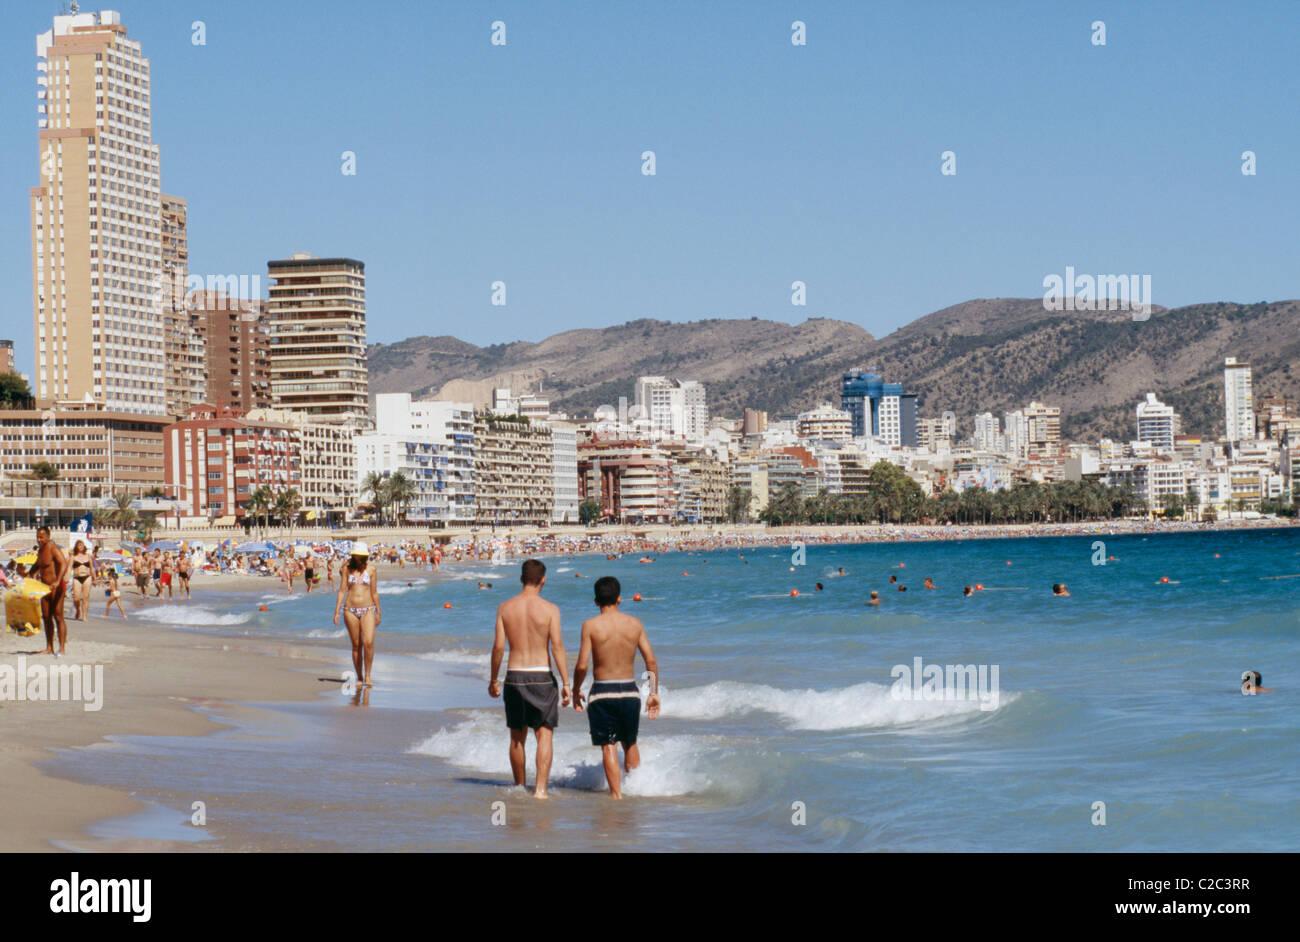 Benidorm Valencia Spain Beach Resort Hotels Seaside With People